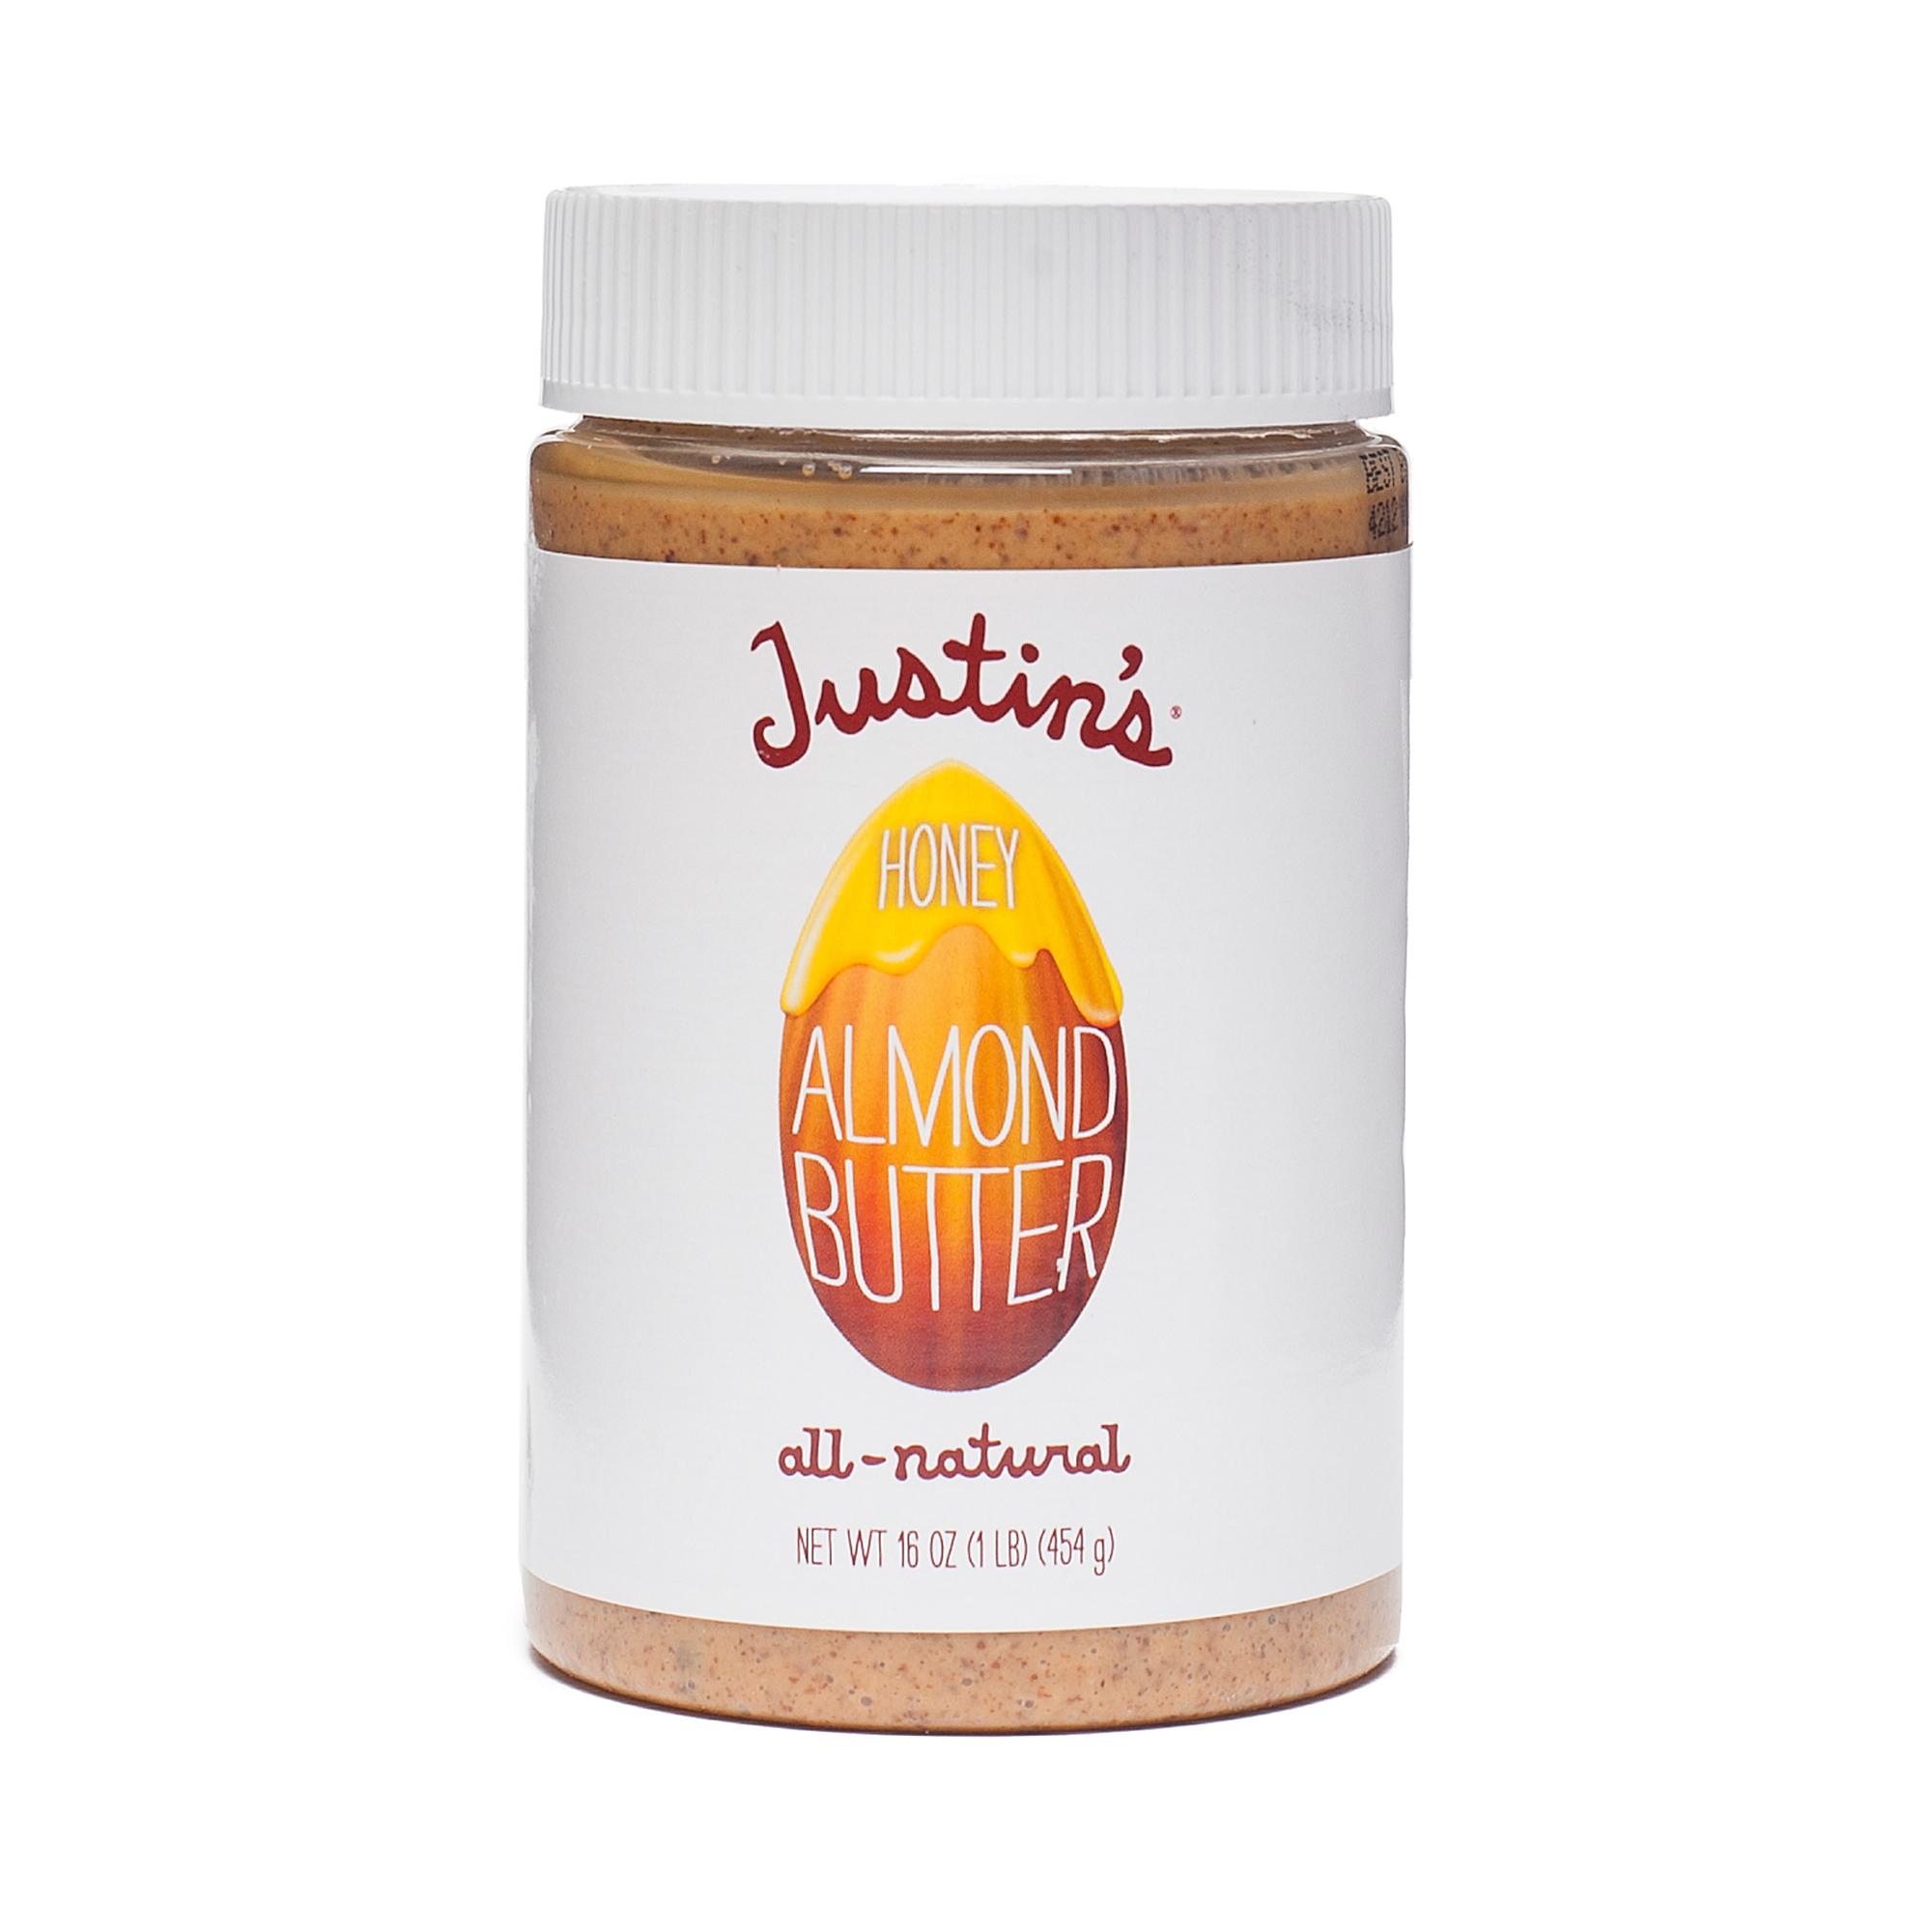 Justin Honey Almond Butter